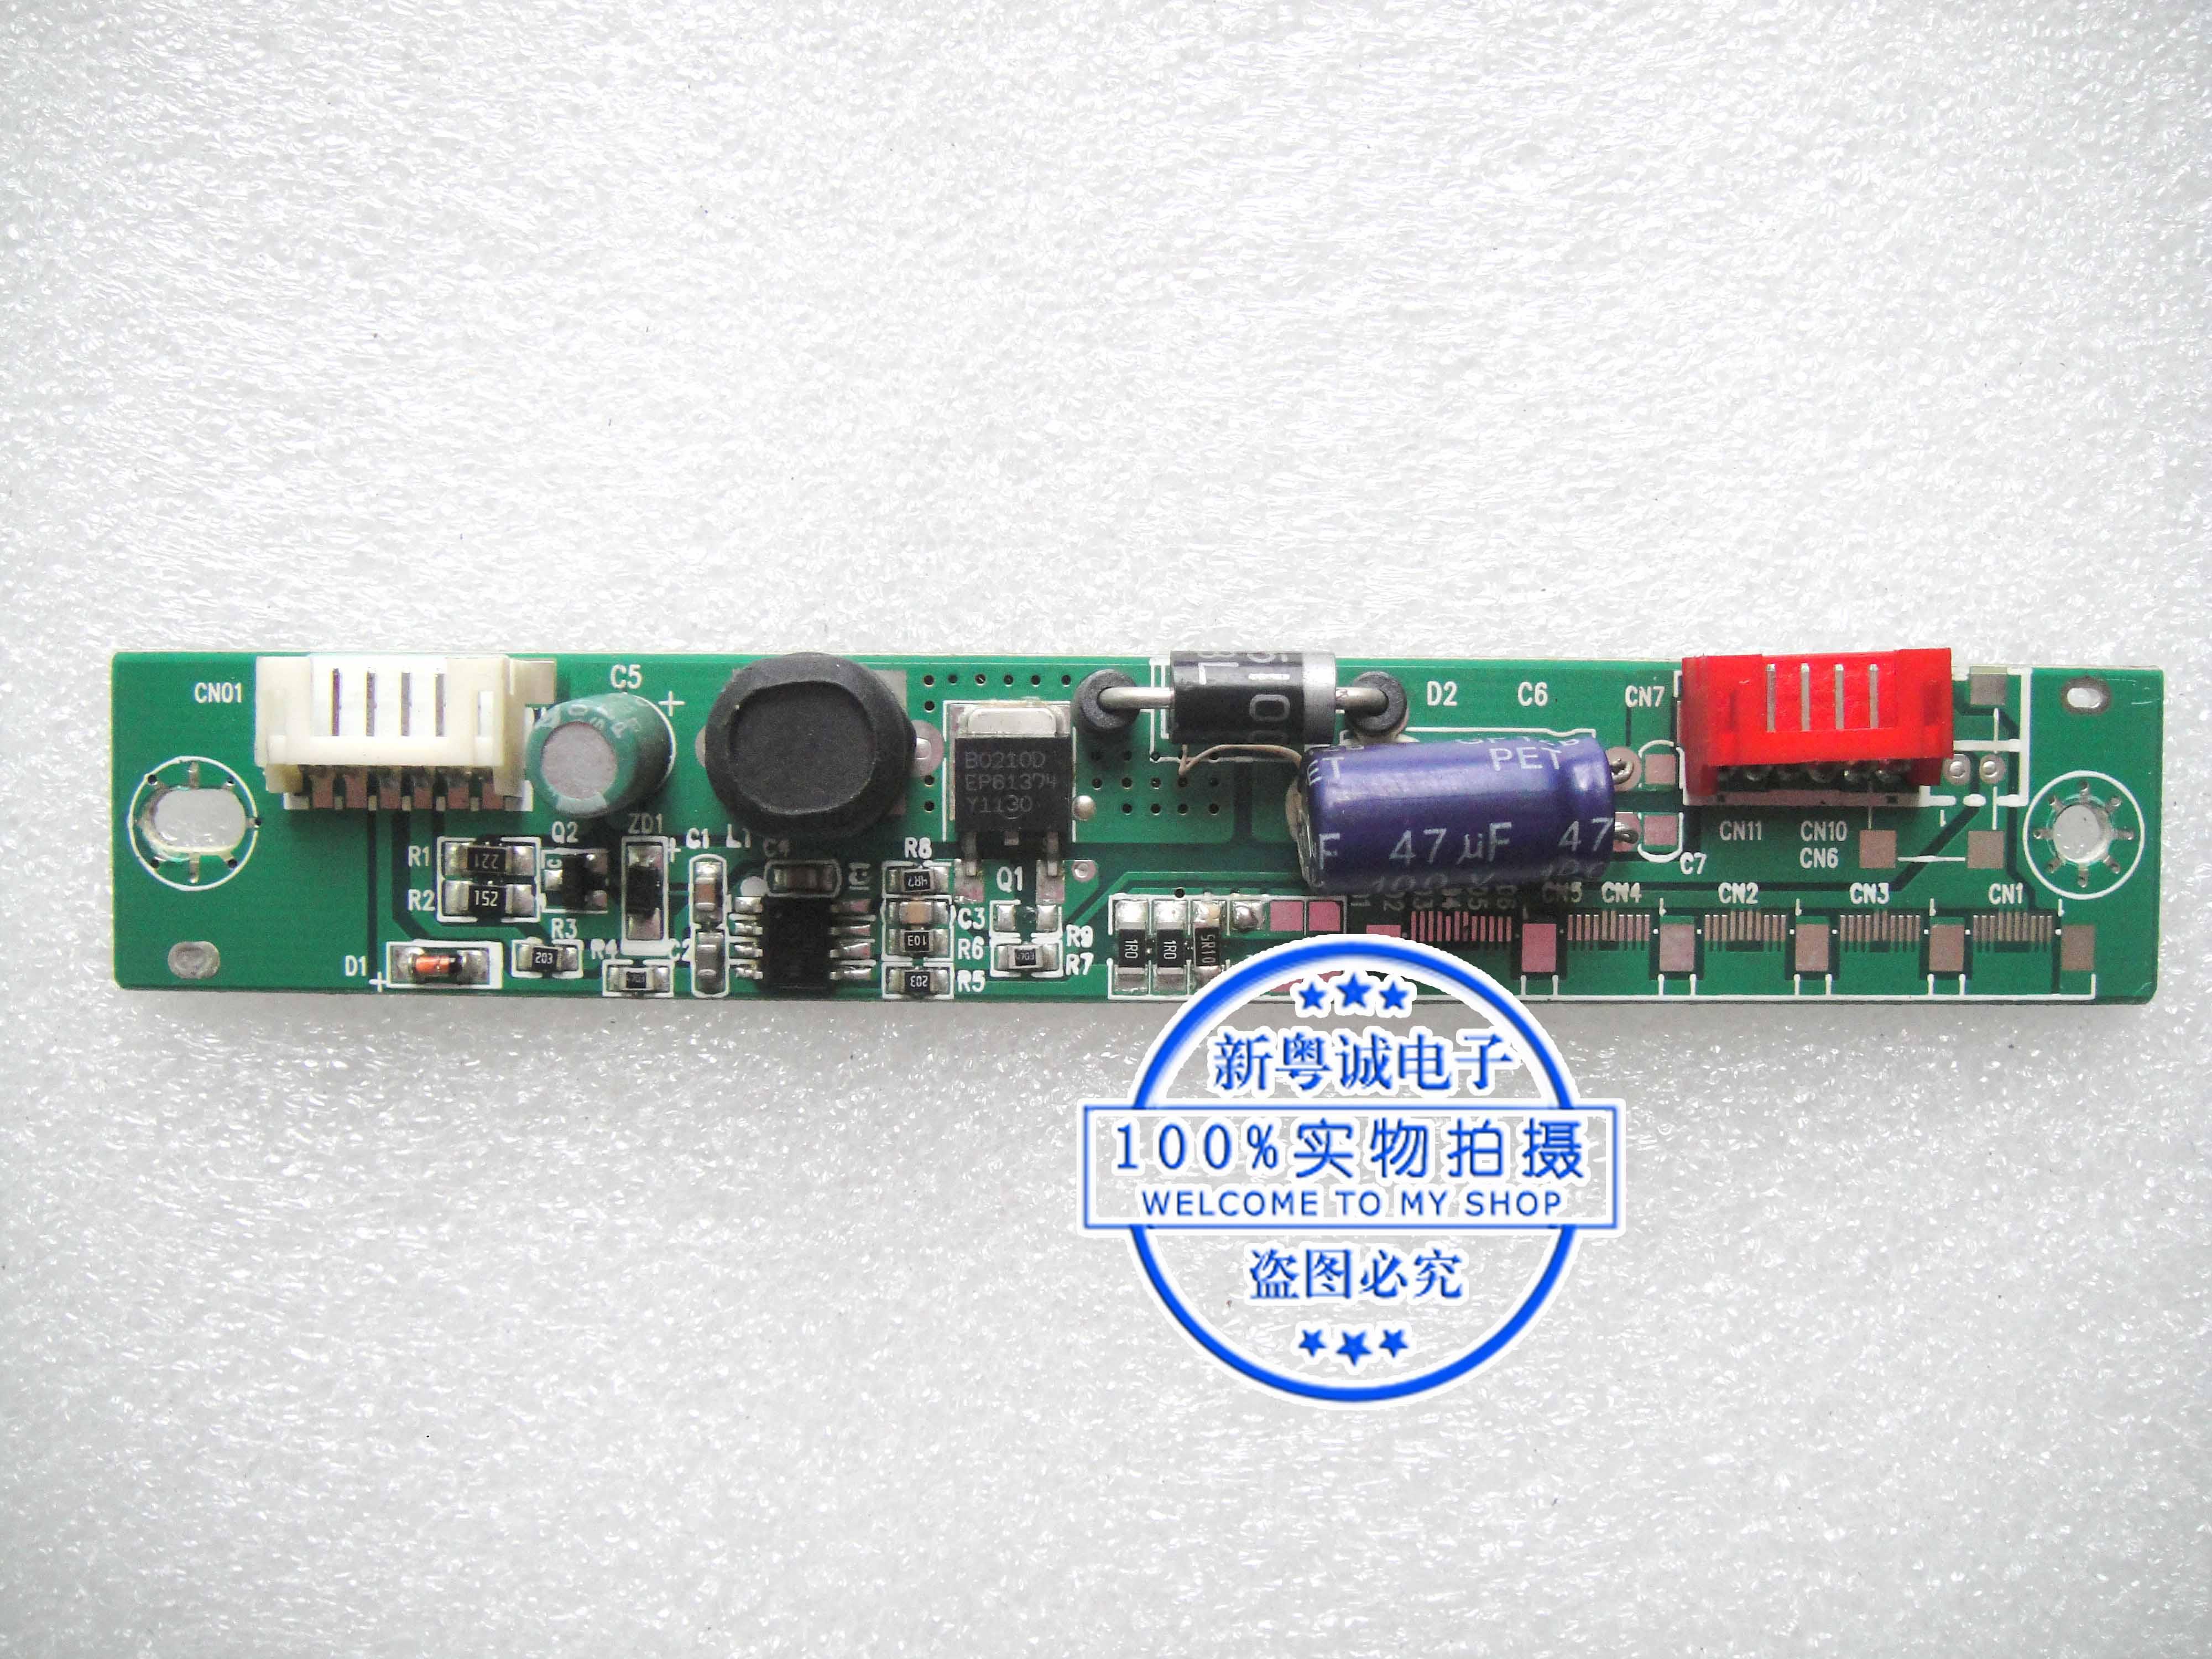 LED-D018 V1.1 عالية الجهد بار LD6006VF/M236MWF2-RO 29V 480mA 6203003101